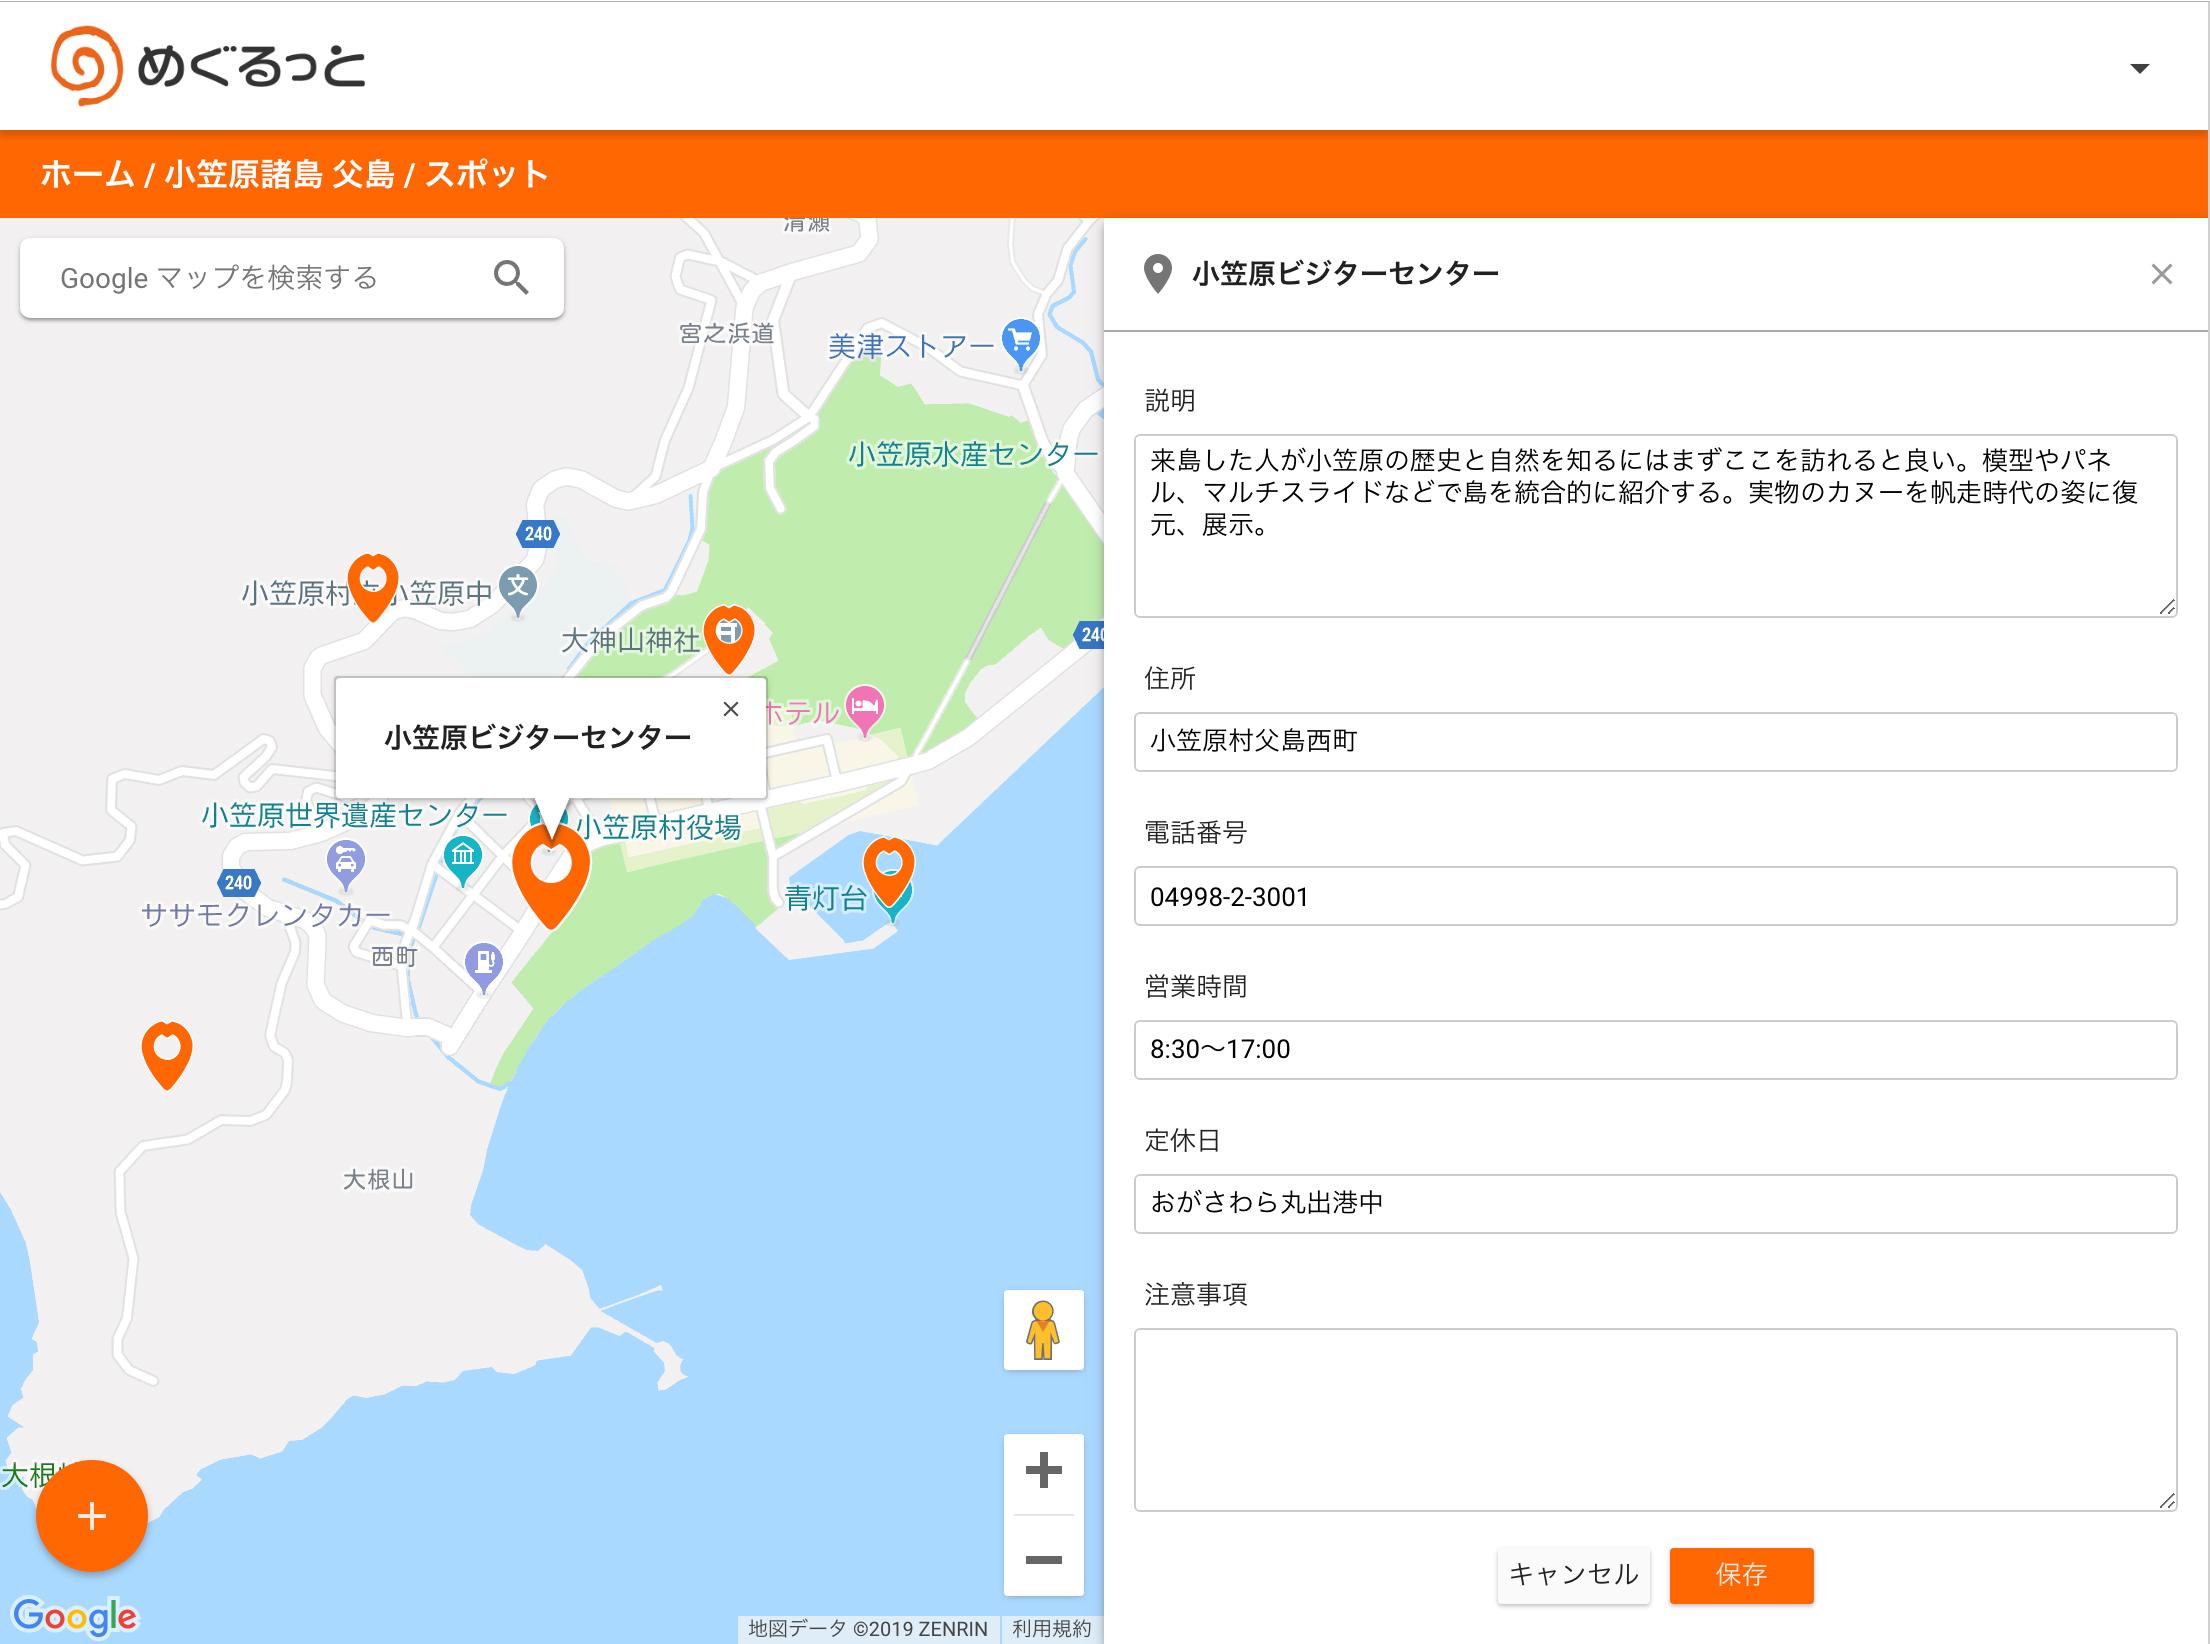 観光情報の登録画面